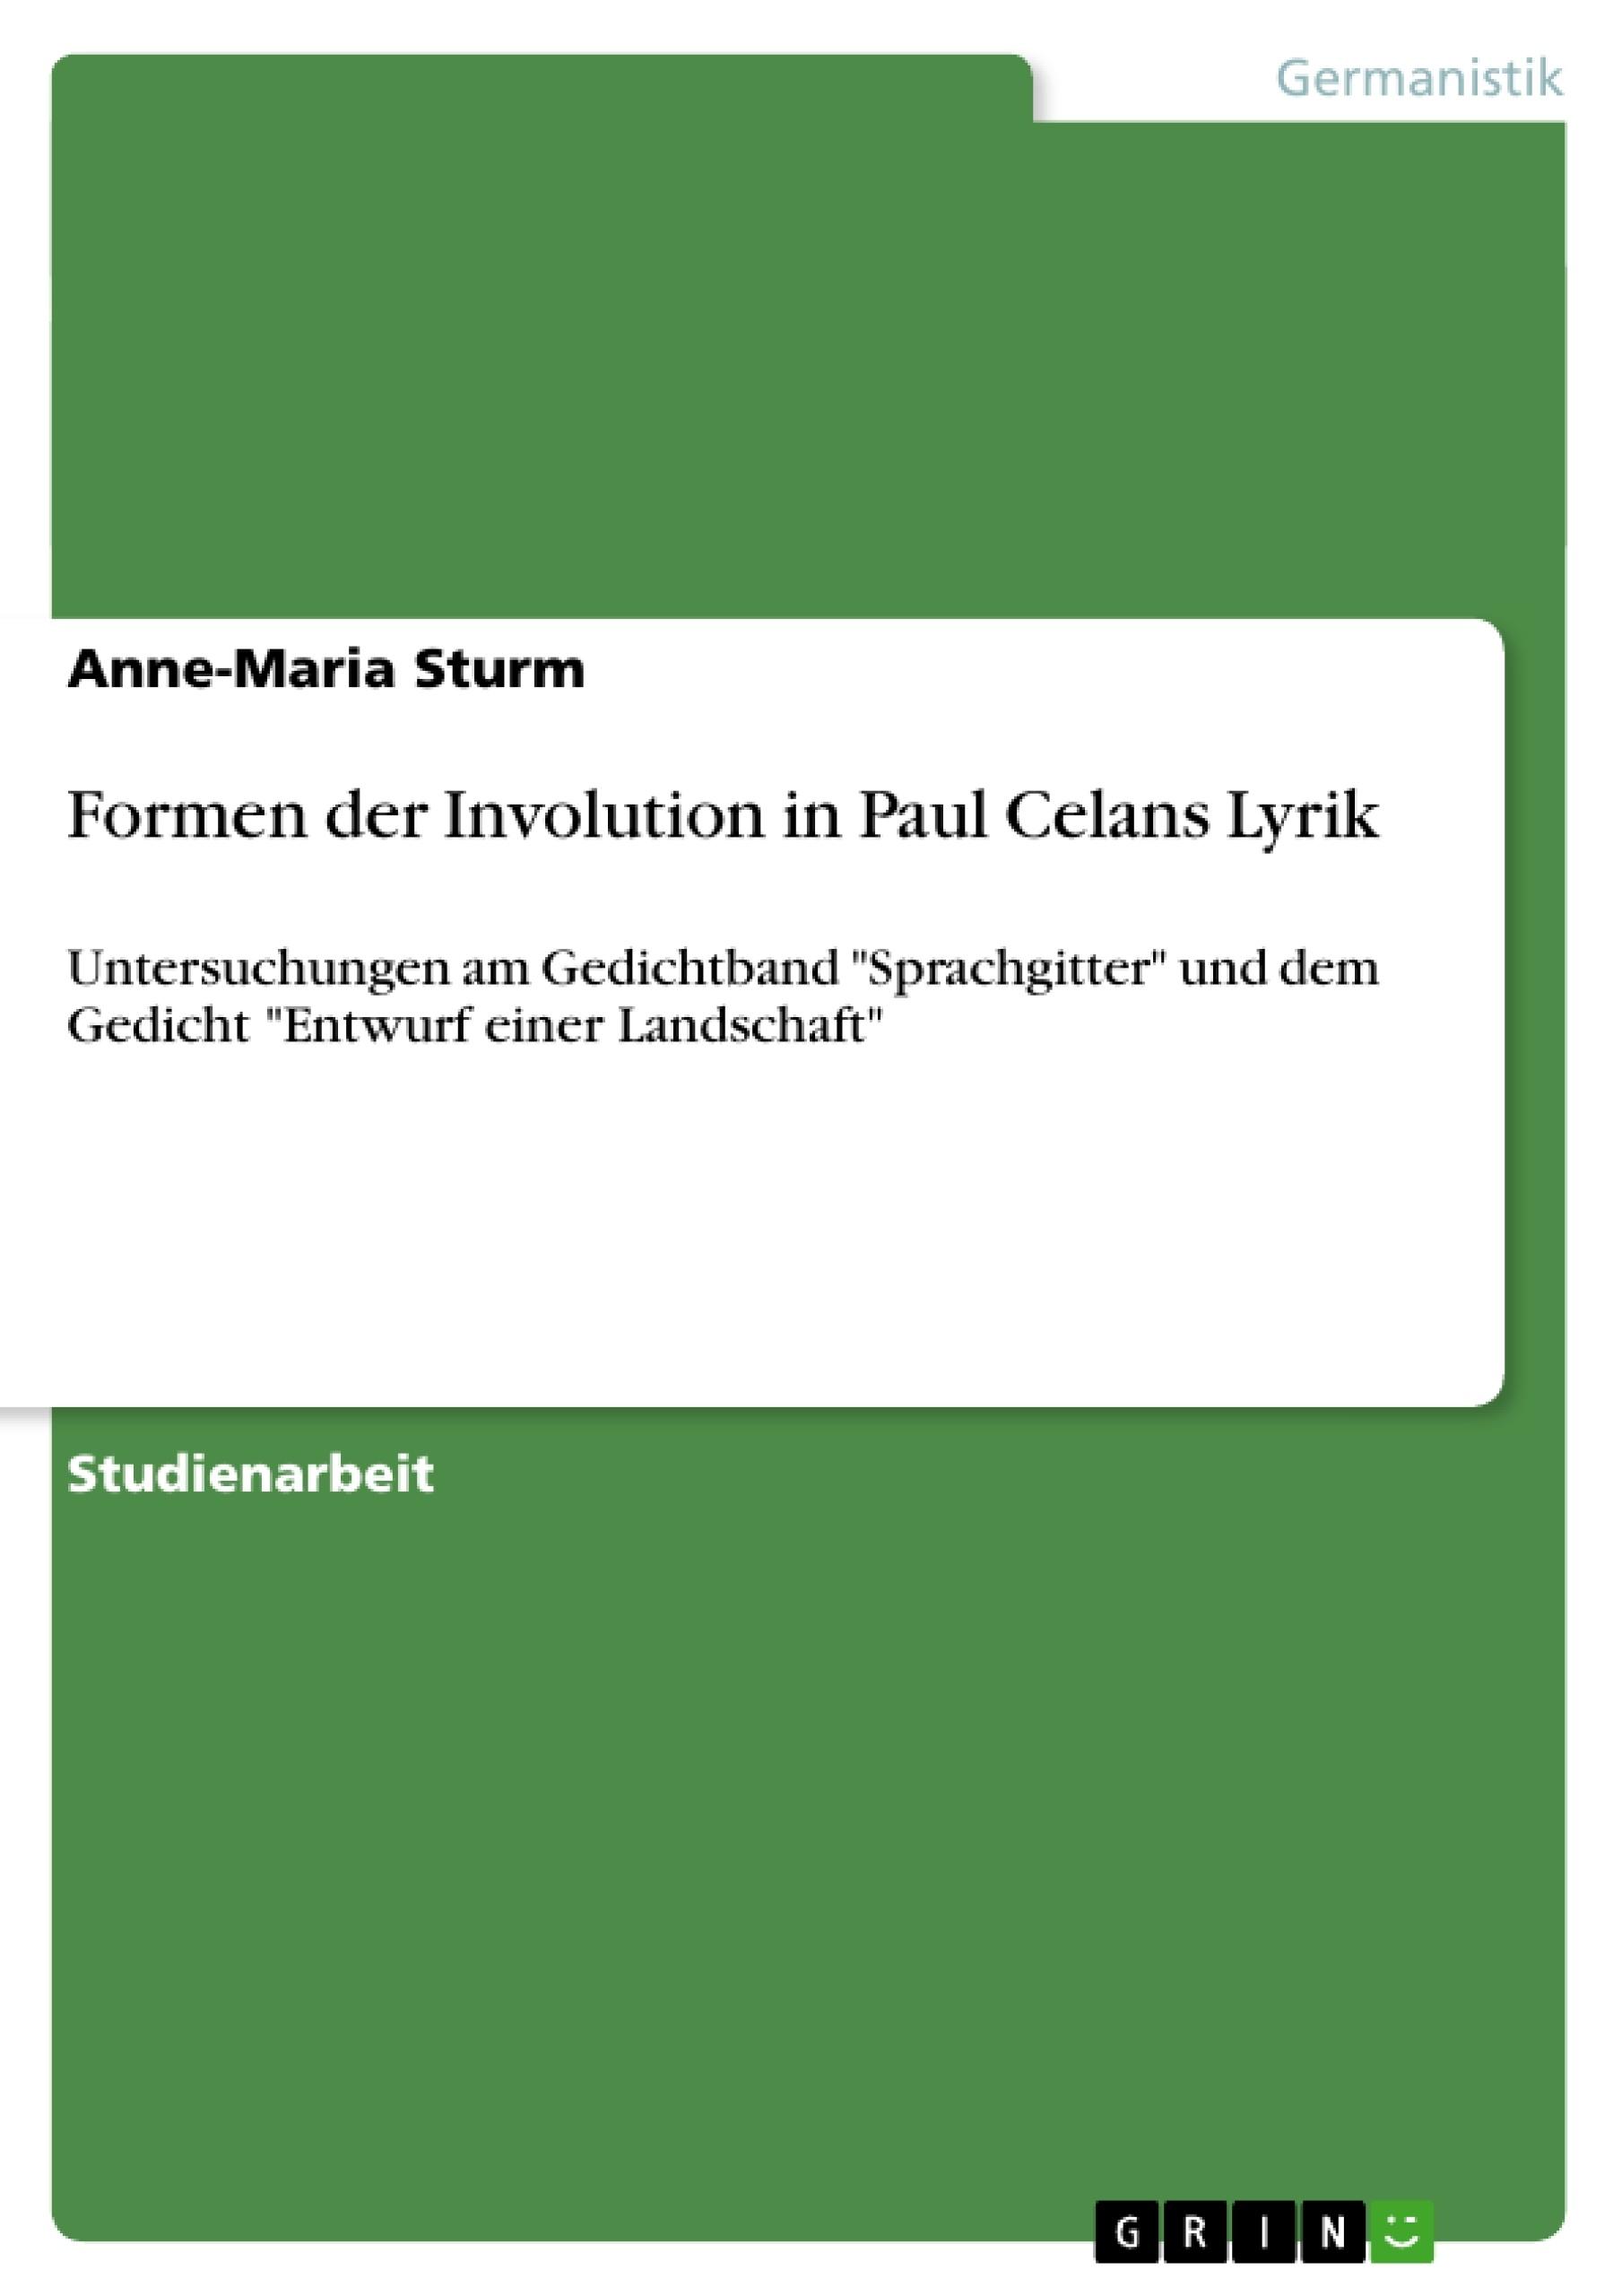 Titel: Formen der Involution in Paul Celans Lyrik